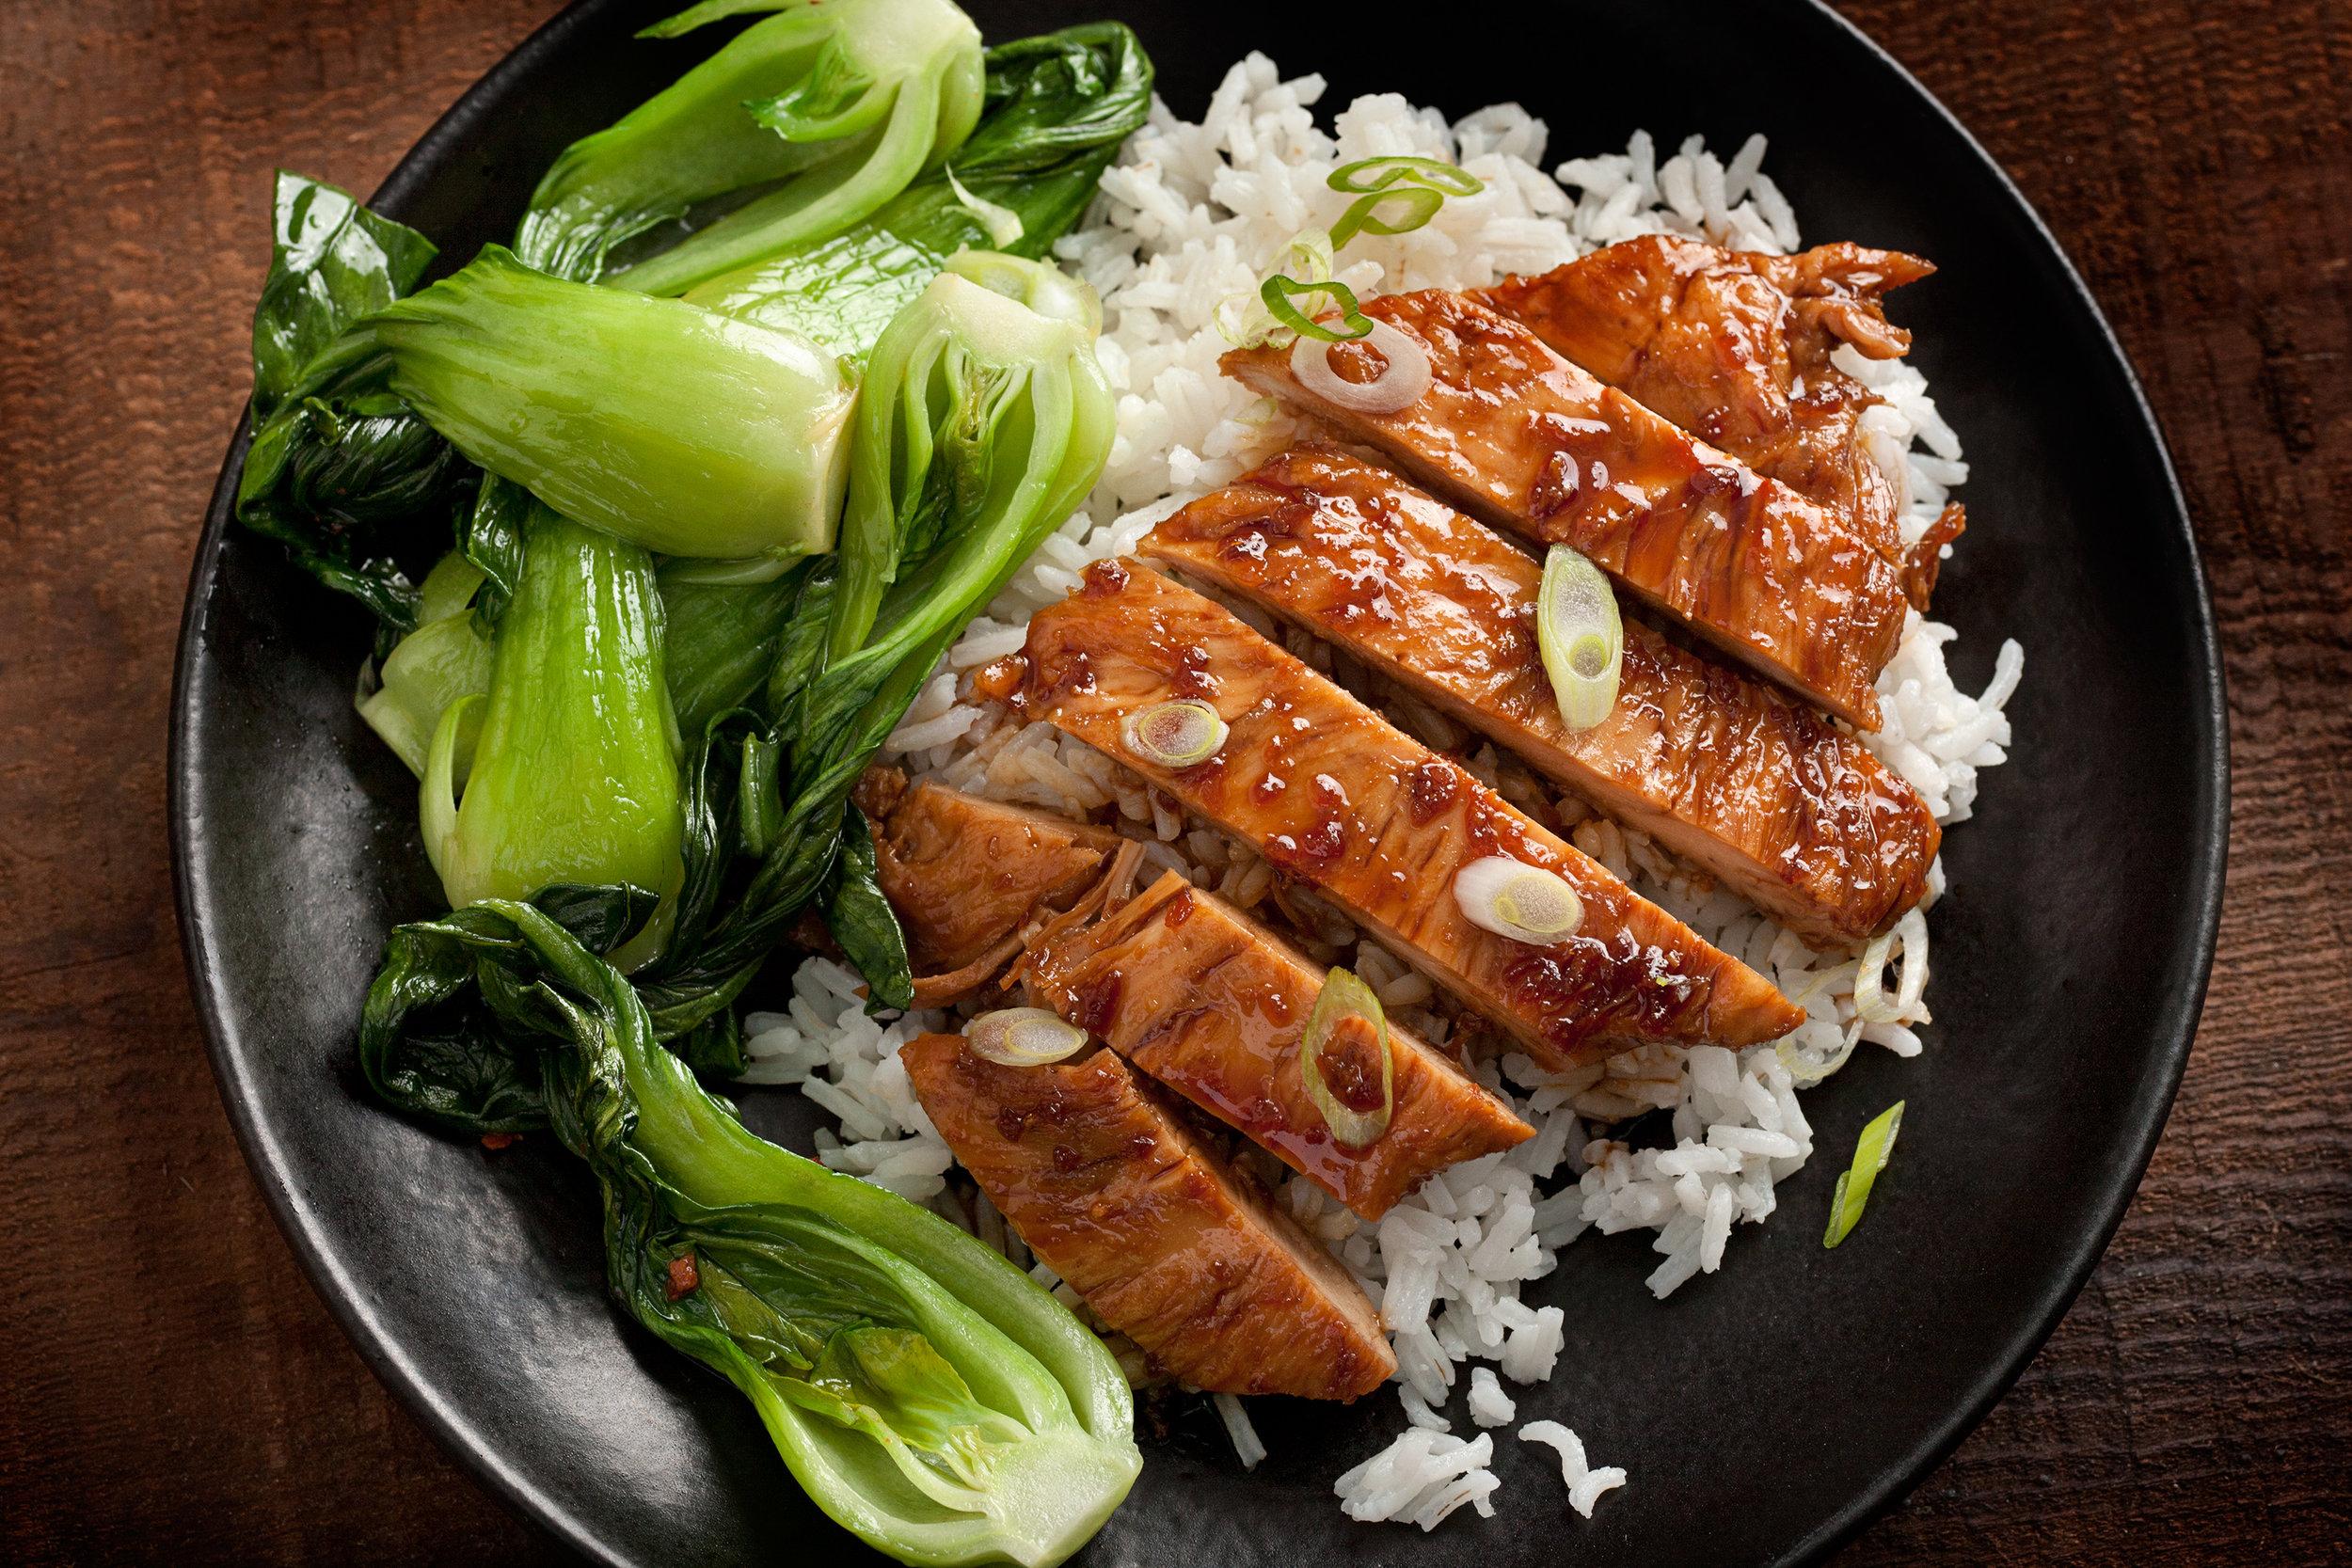 30551_easy_teriyaki_chicken_3000x2000.jpg